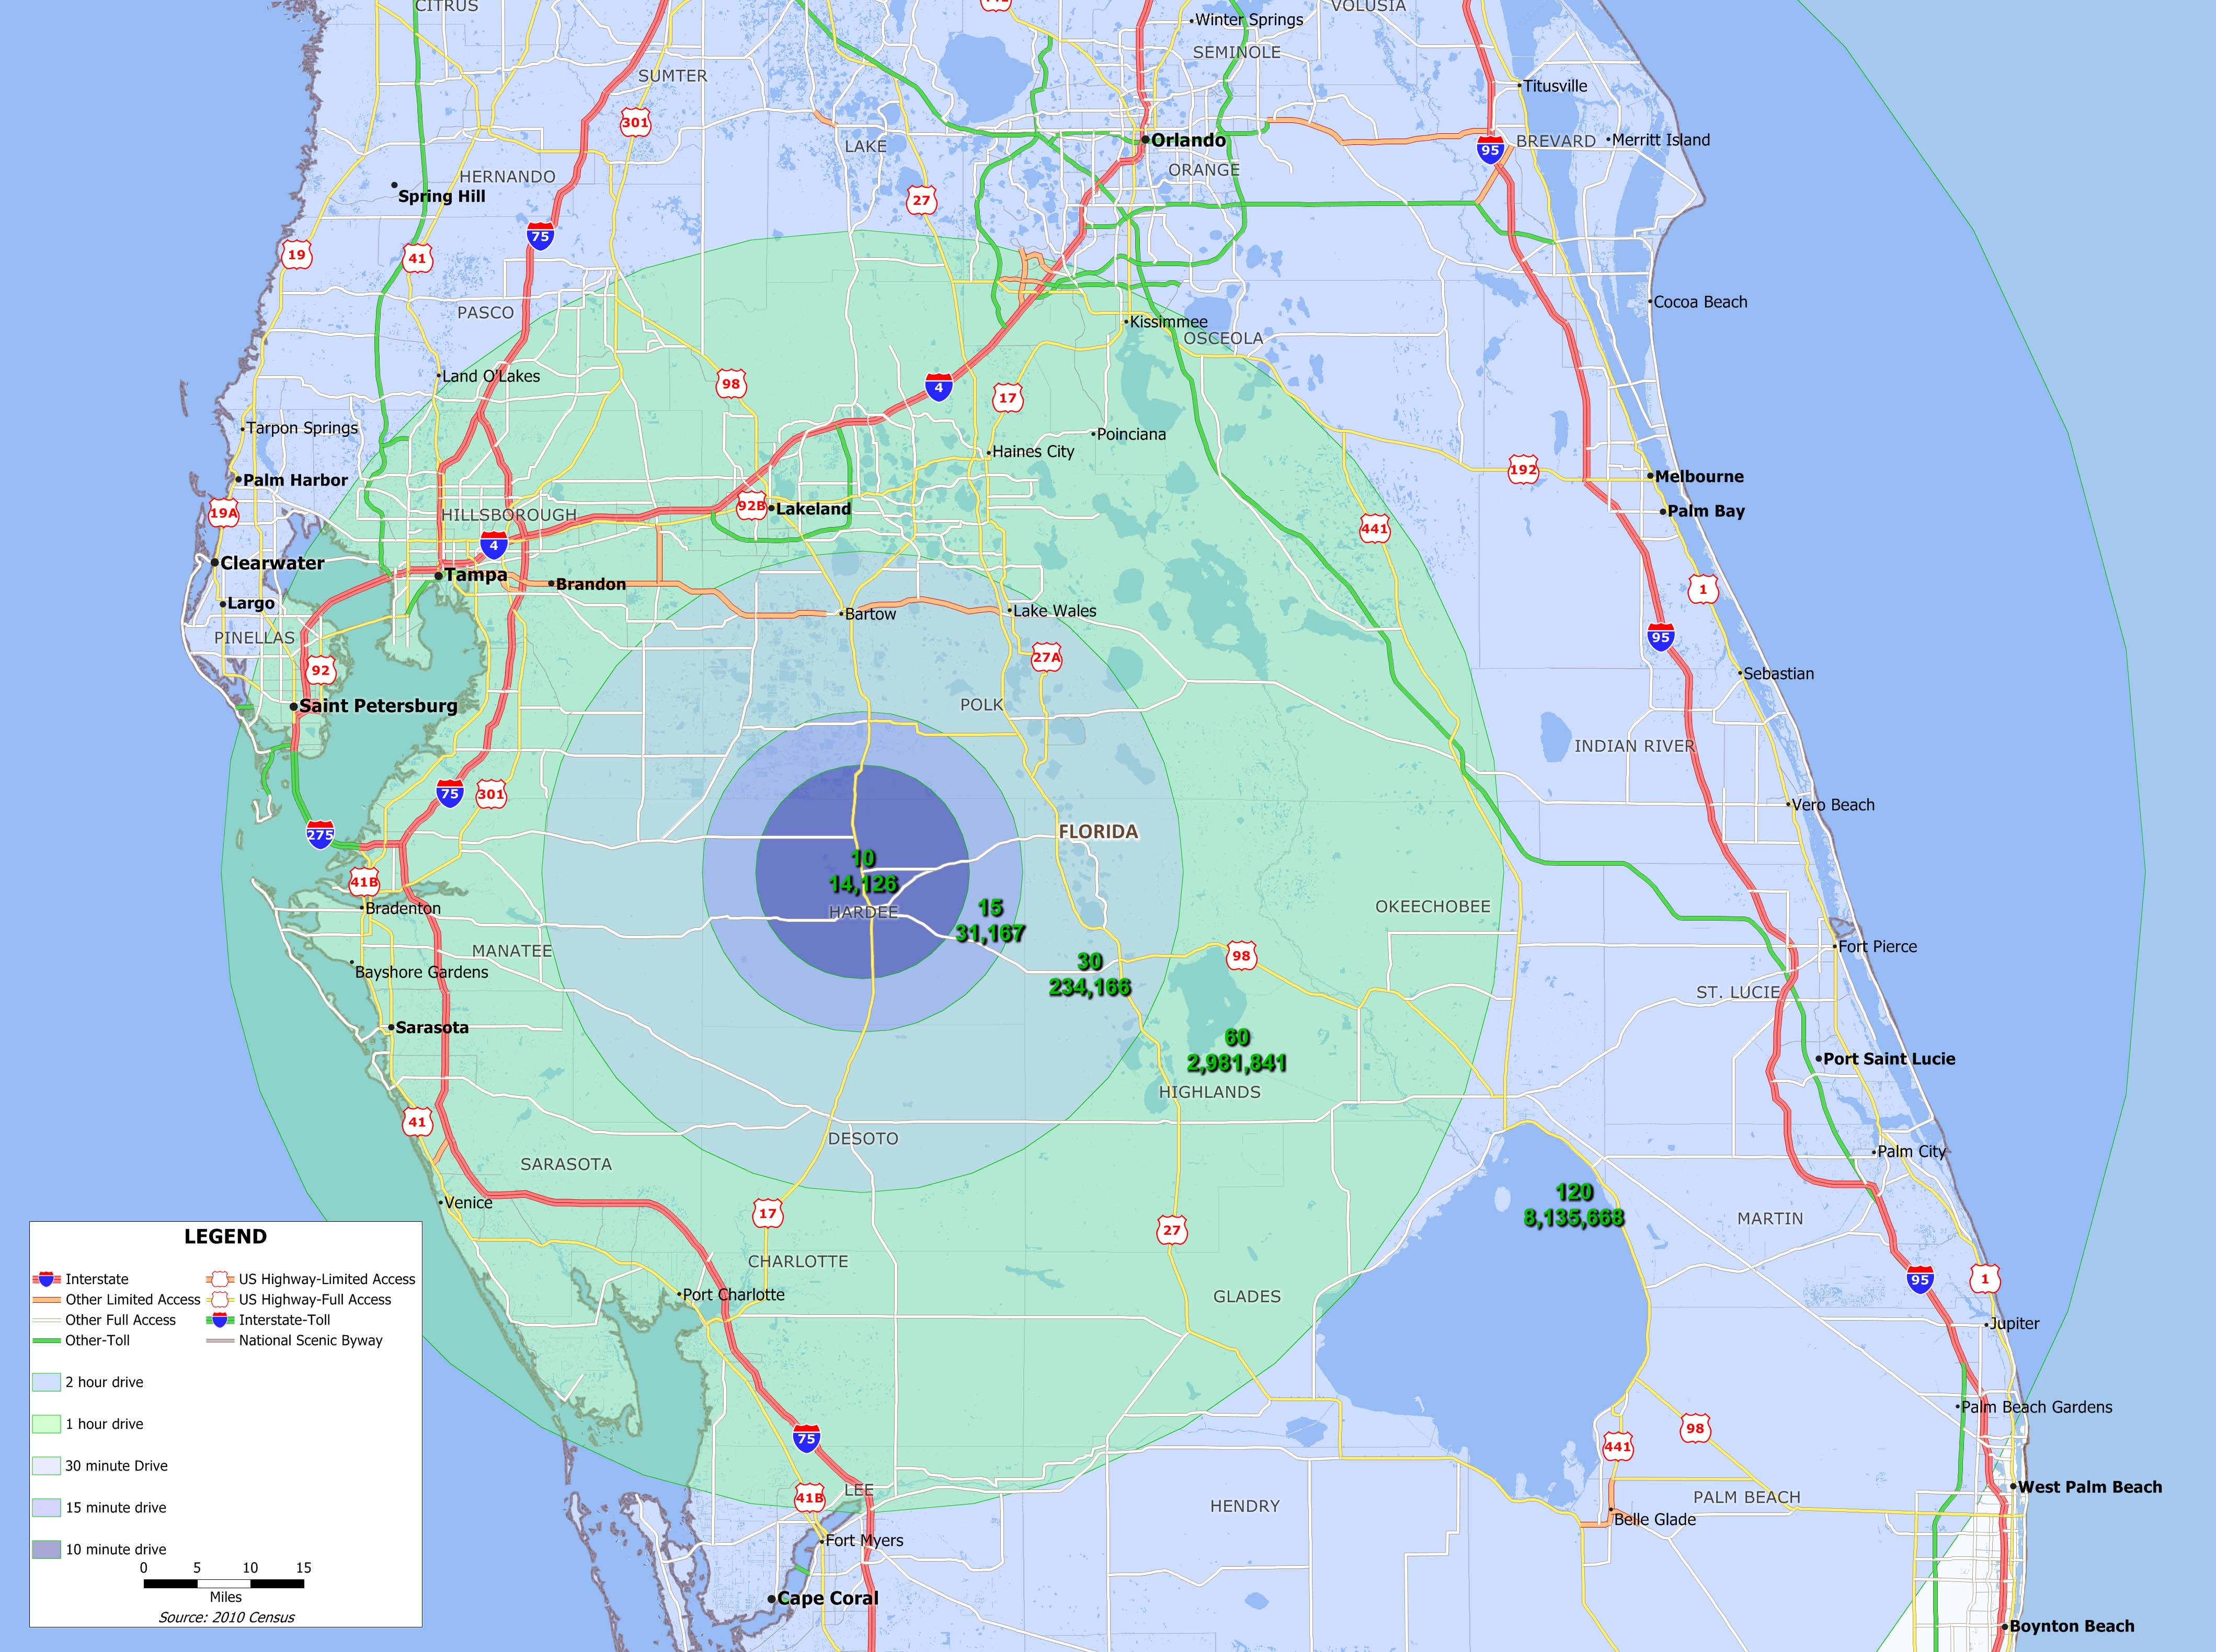 Hardee County Florida Demographics